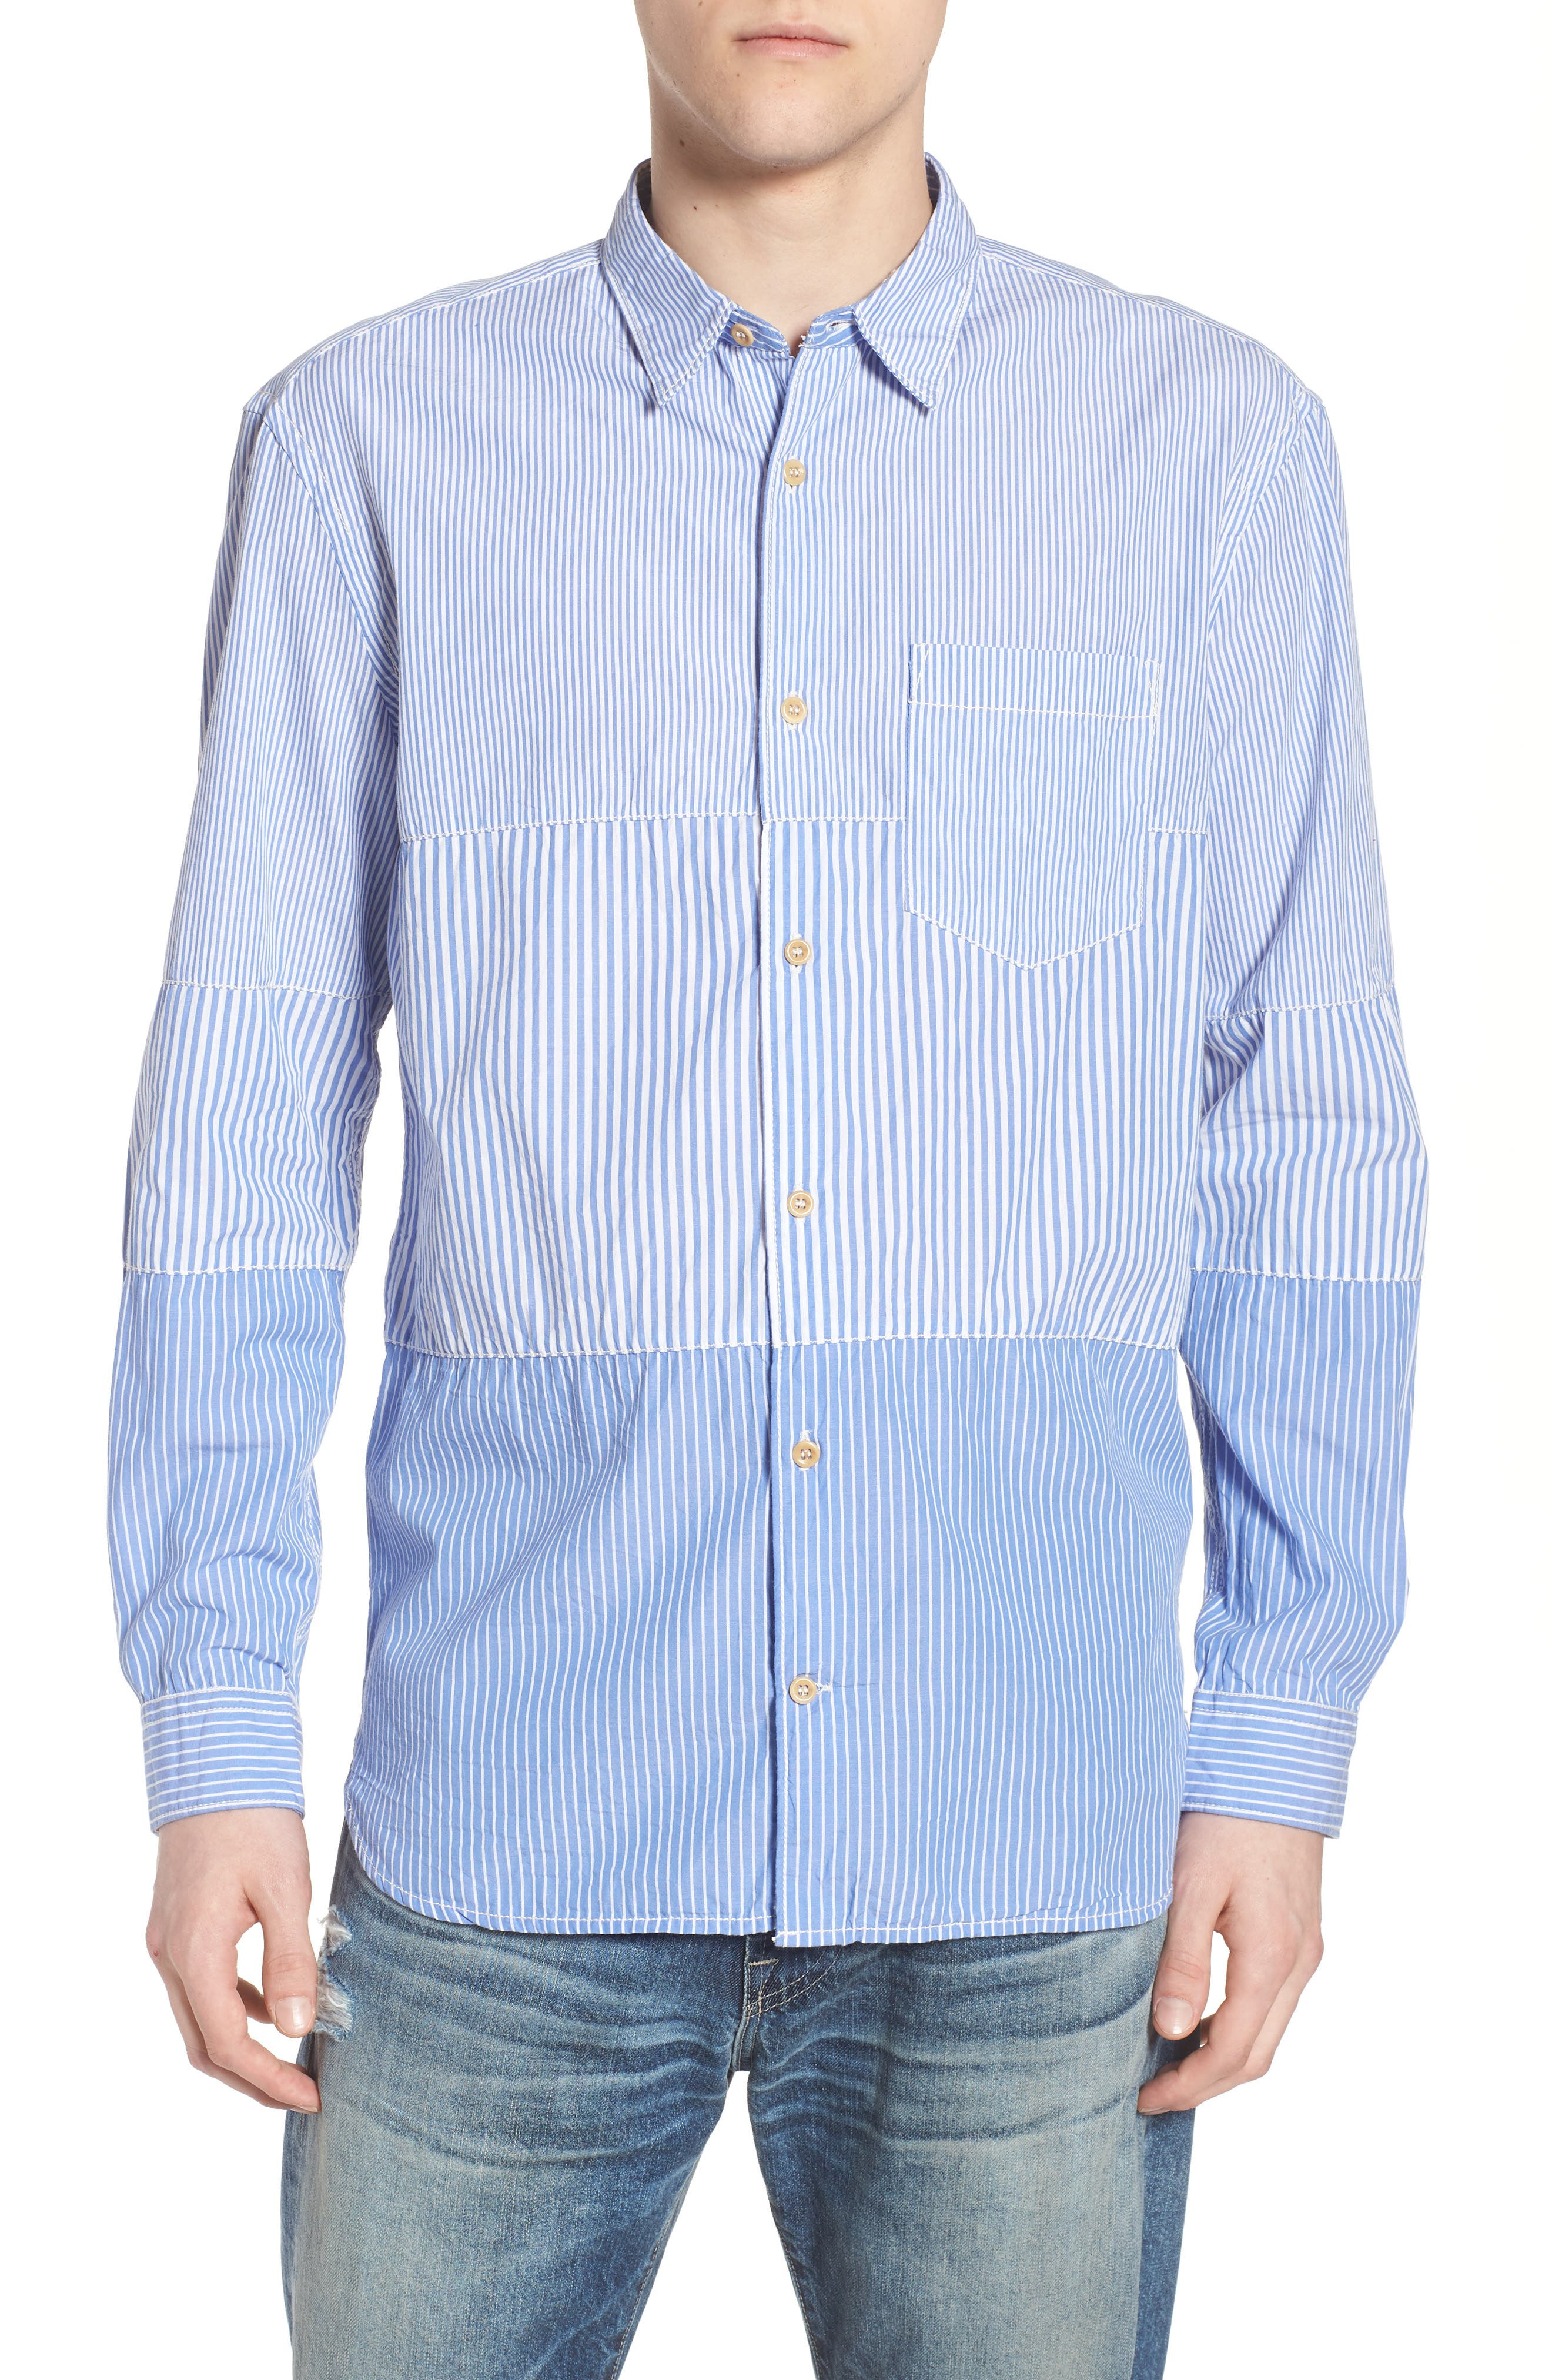 Regular Fit Stripe Sport Shirt,                         Main,                         color, All Stripe